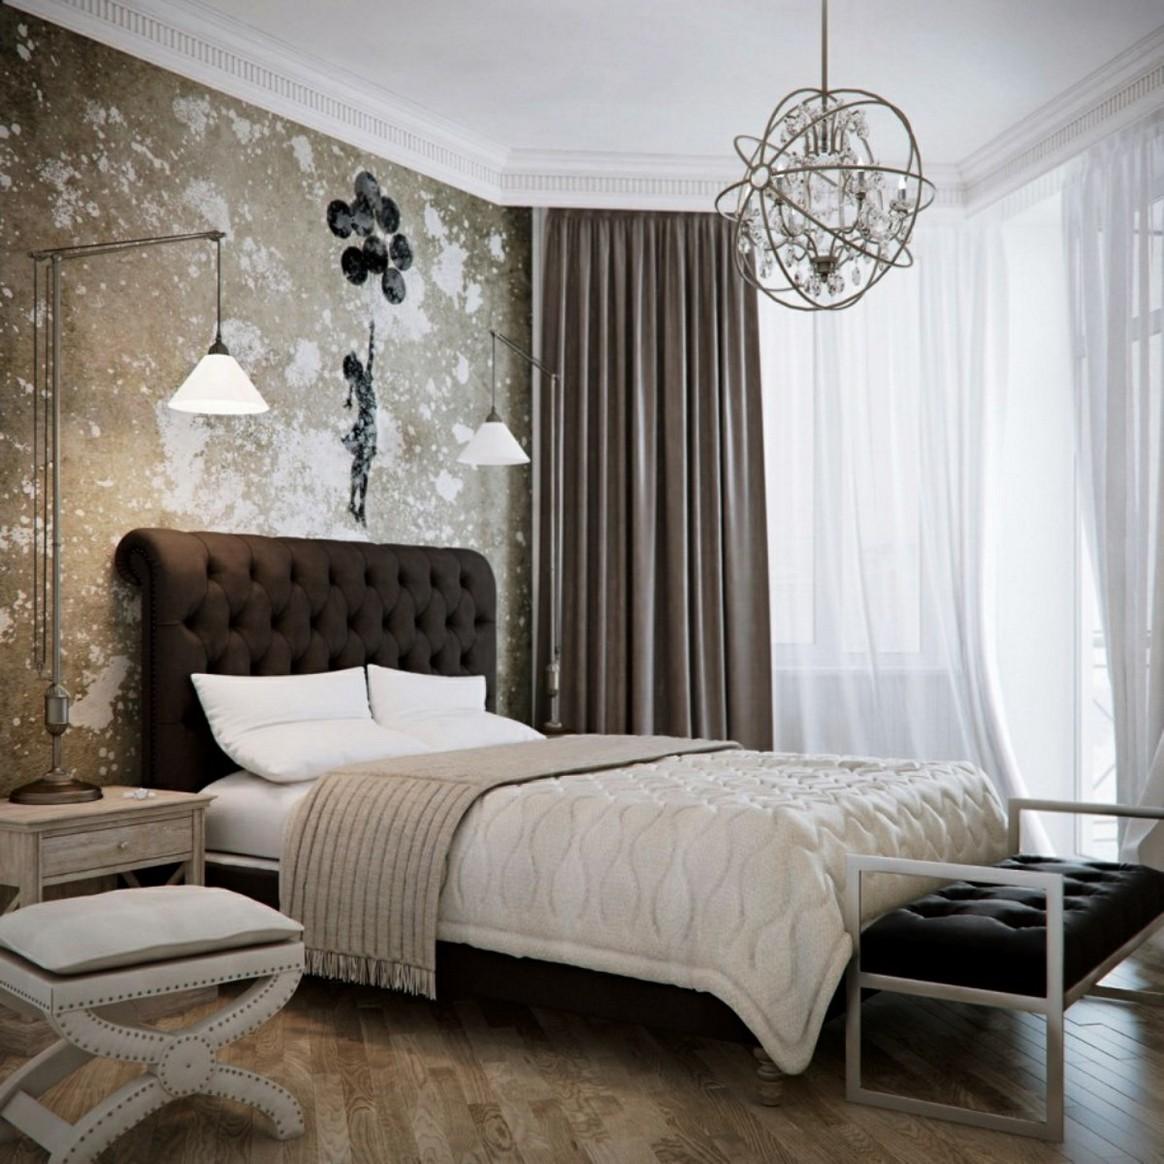 diy home decor ideas for unique home decor ideas bedroom 1 1